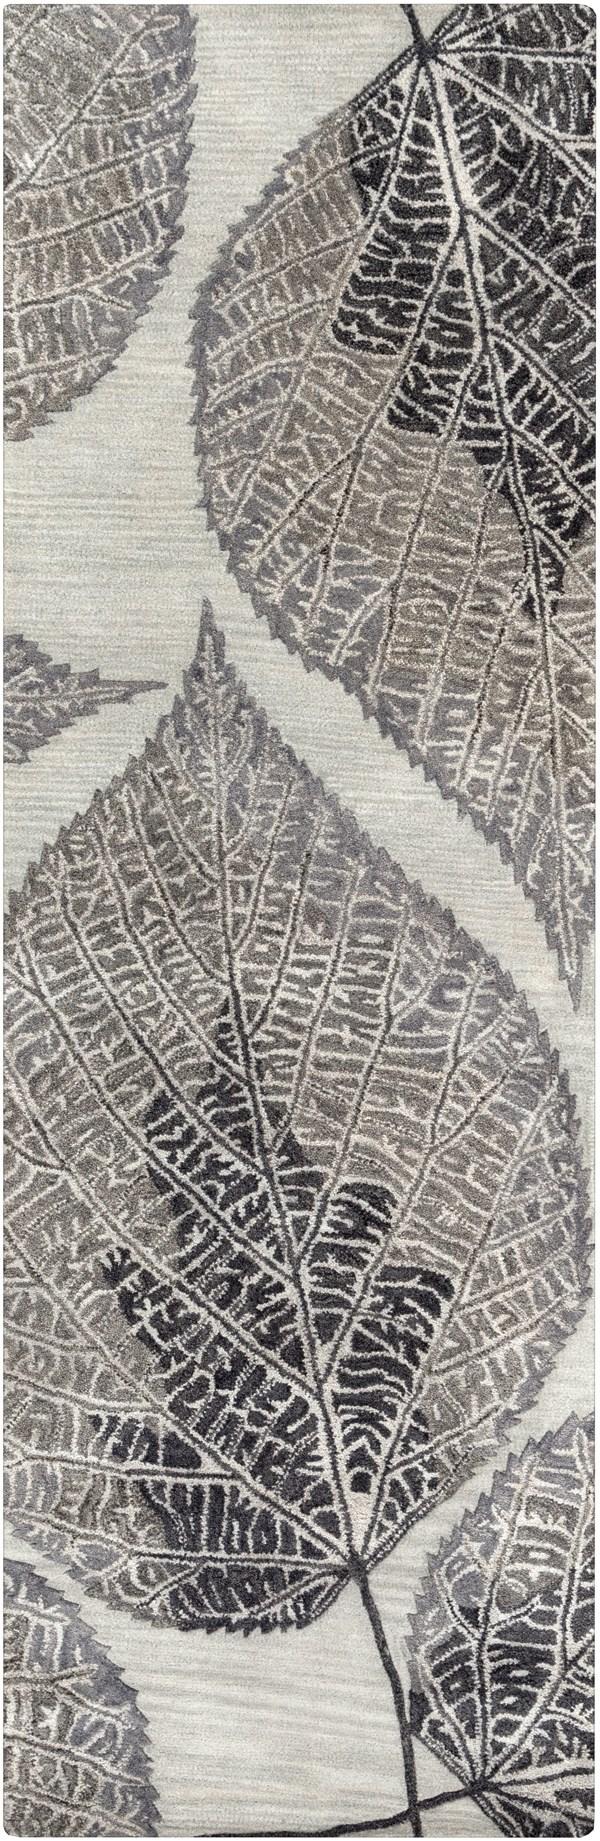 Light Gray, Black, Khaki, Charcoal Floral / Botanical Area Rug